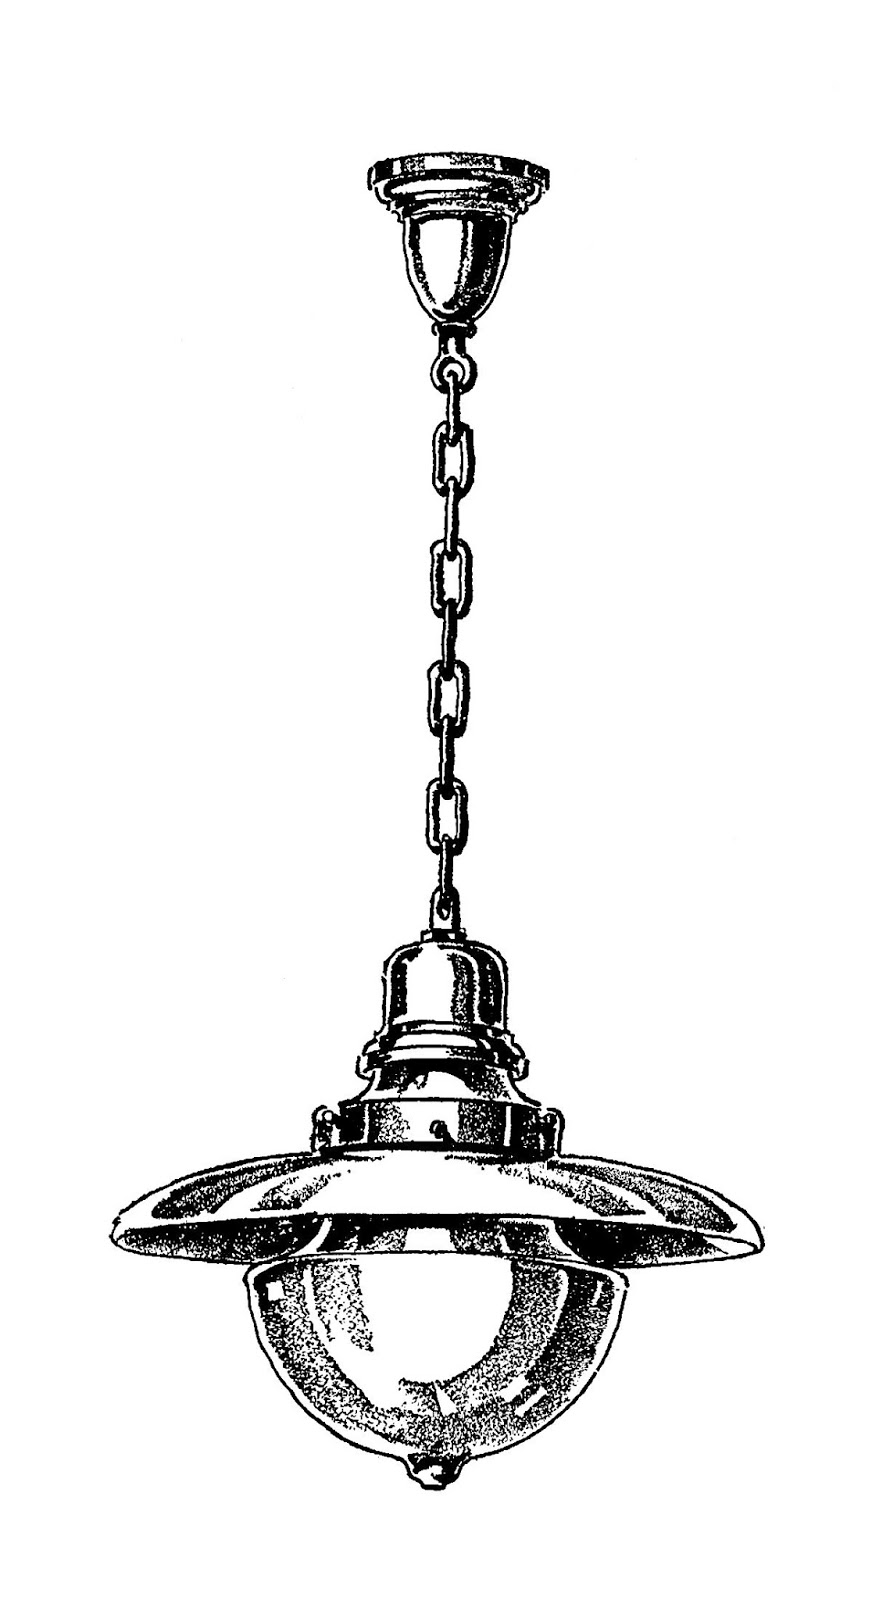 Lamps clipart source light Pyrite lamp Light Ceiling Images: